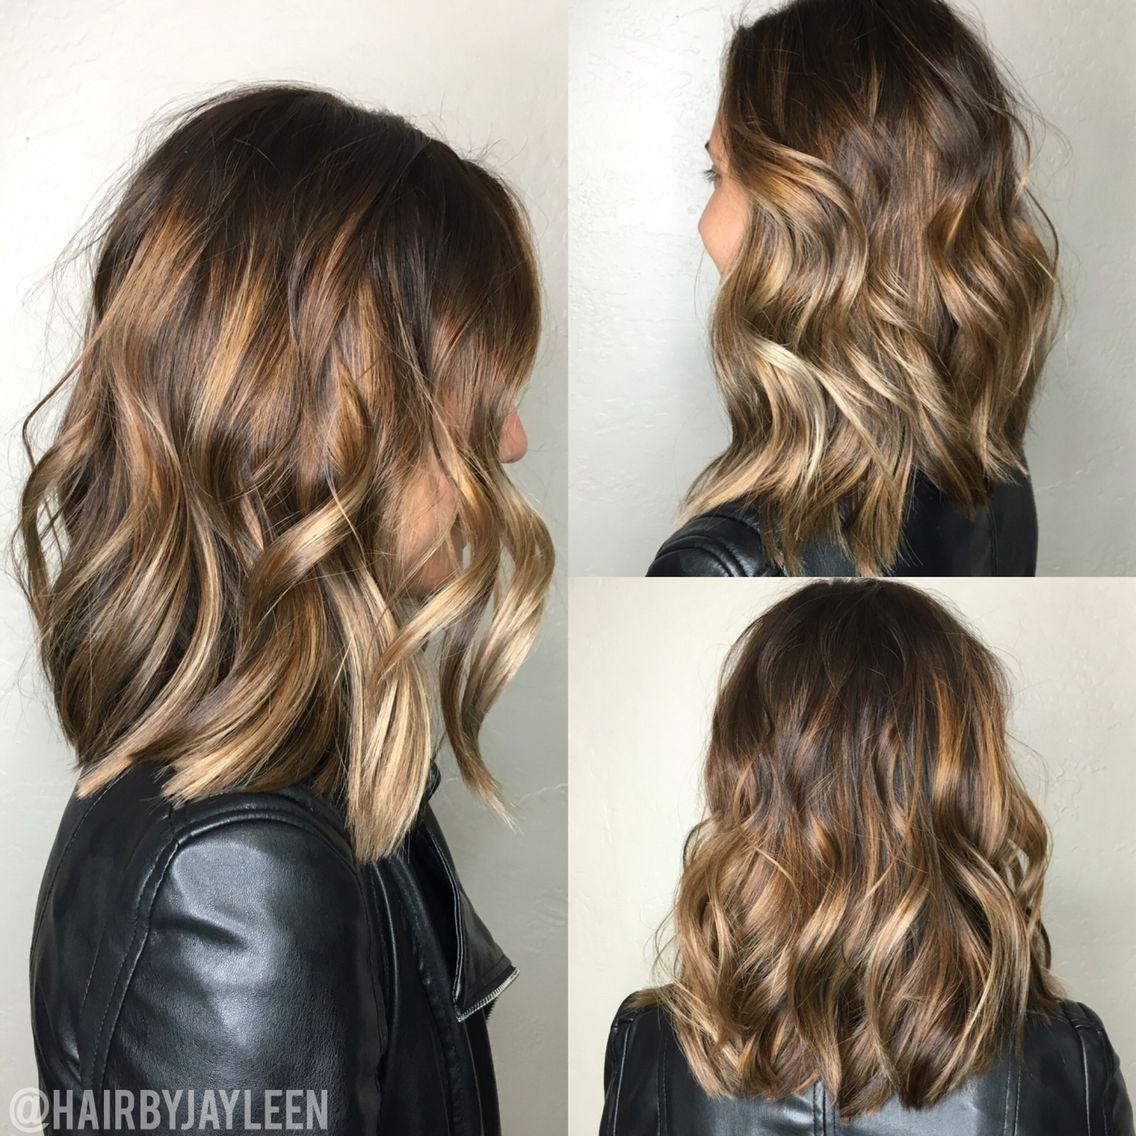 Lob Hairstyle Short Hair Color Blonde Balayage Bronde Hair